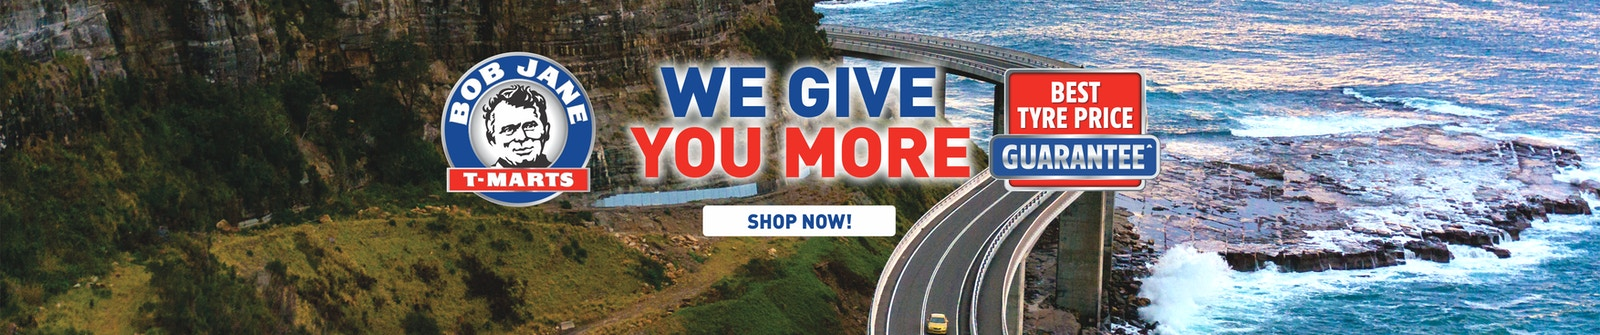 Bob Jane T-Marts Auagust Deals